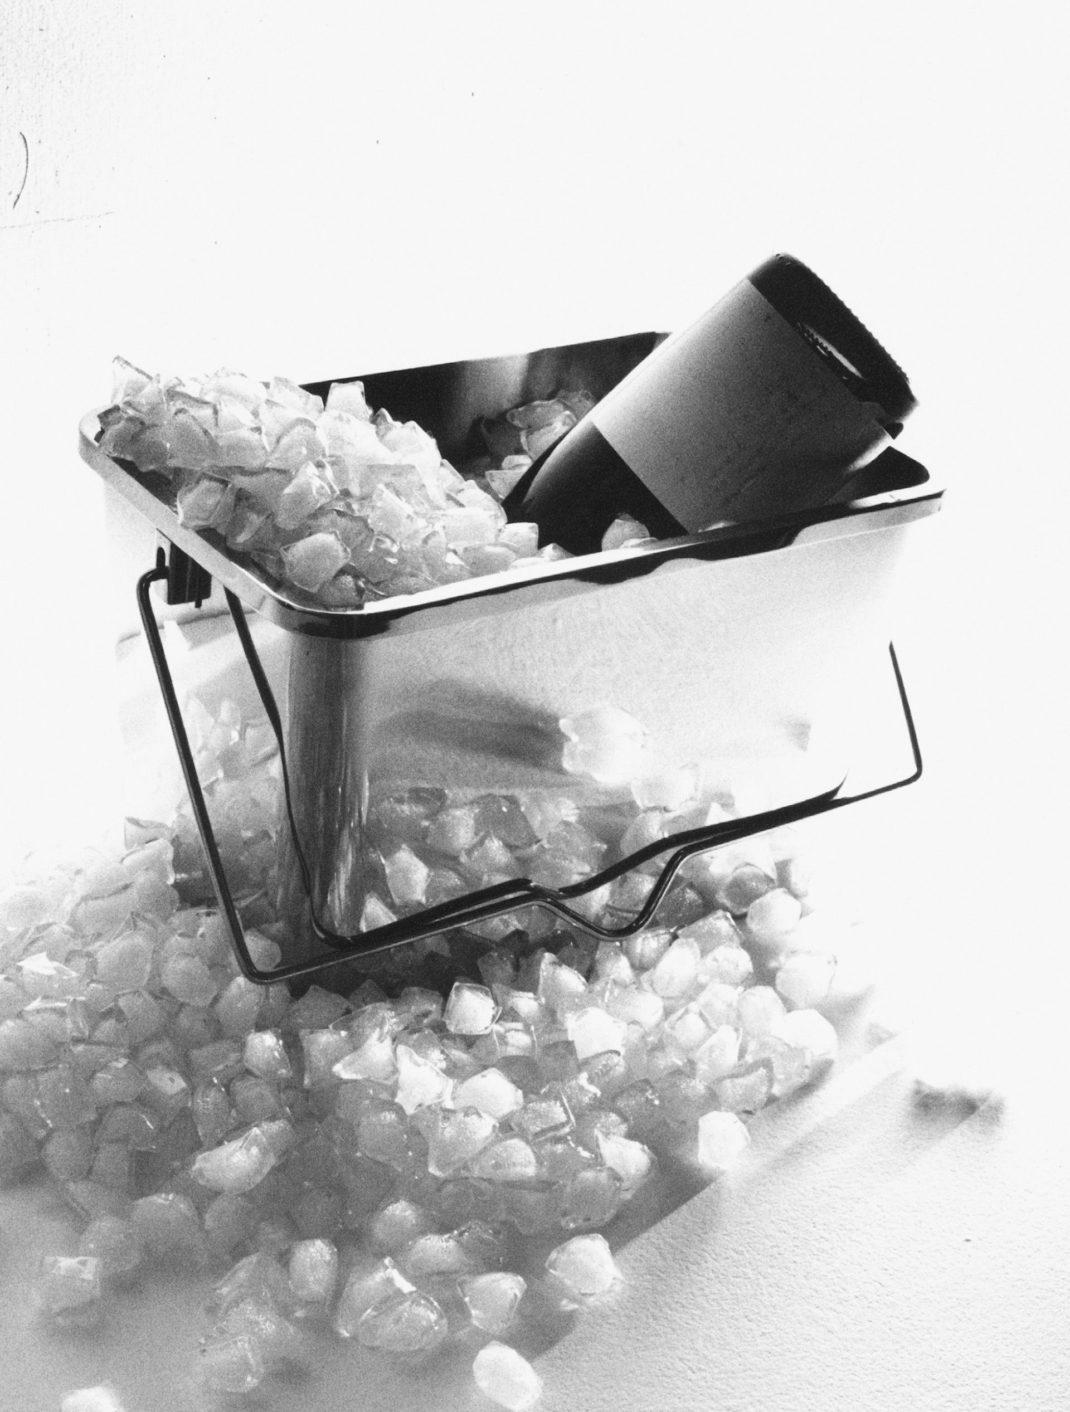 Le seau à glace design Maison Martin Margiela